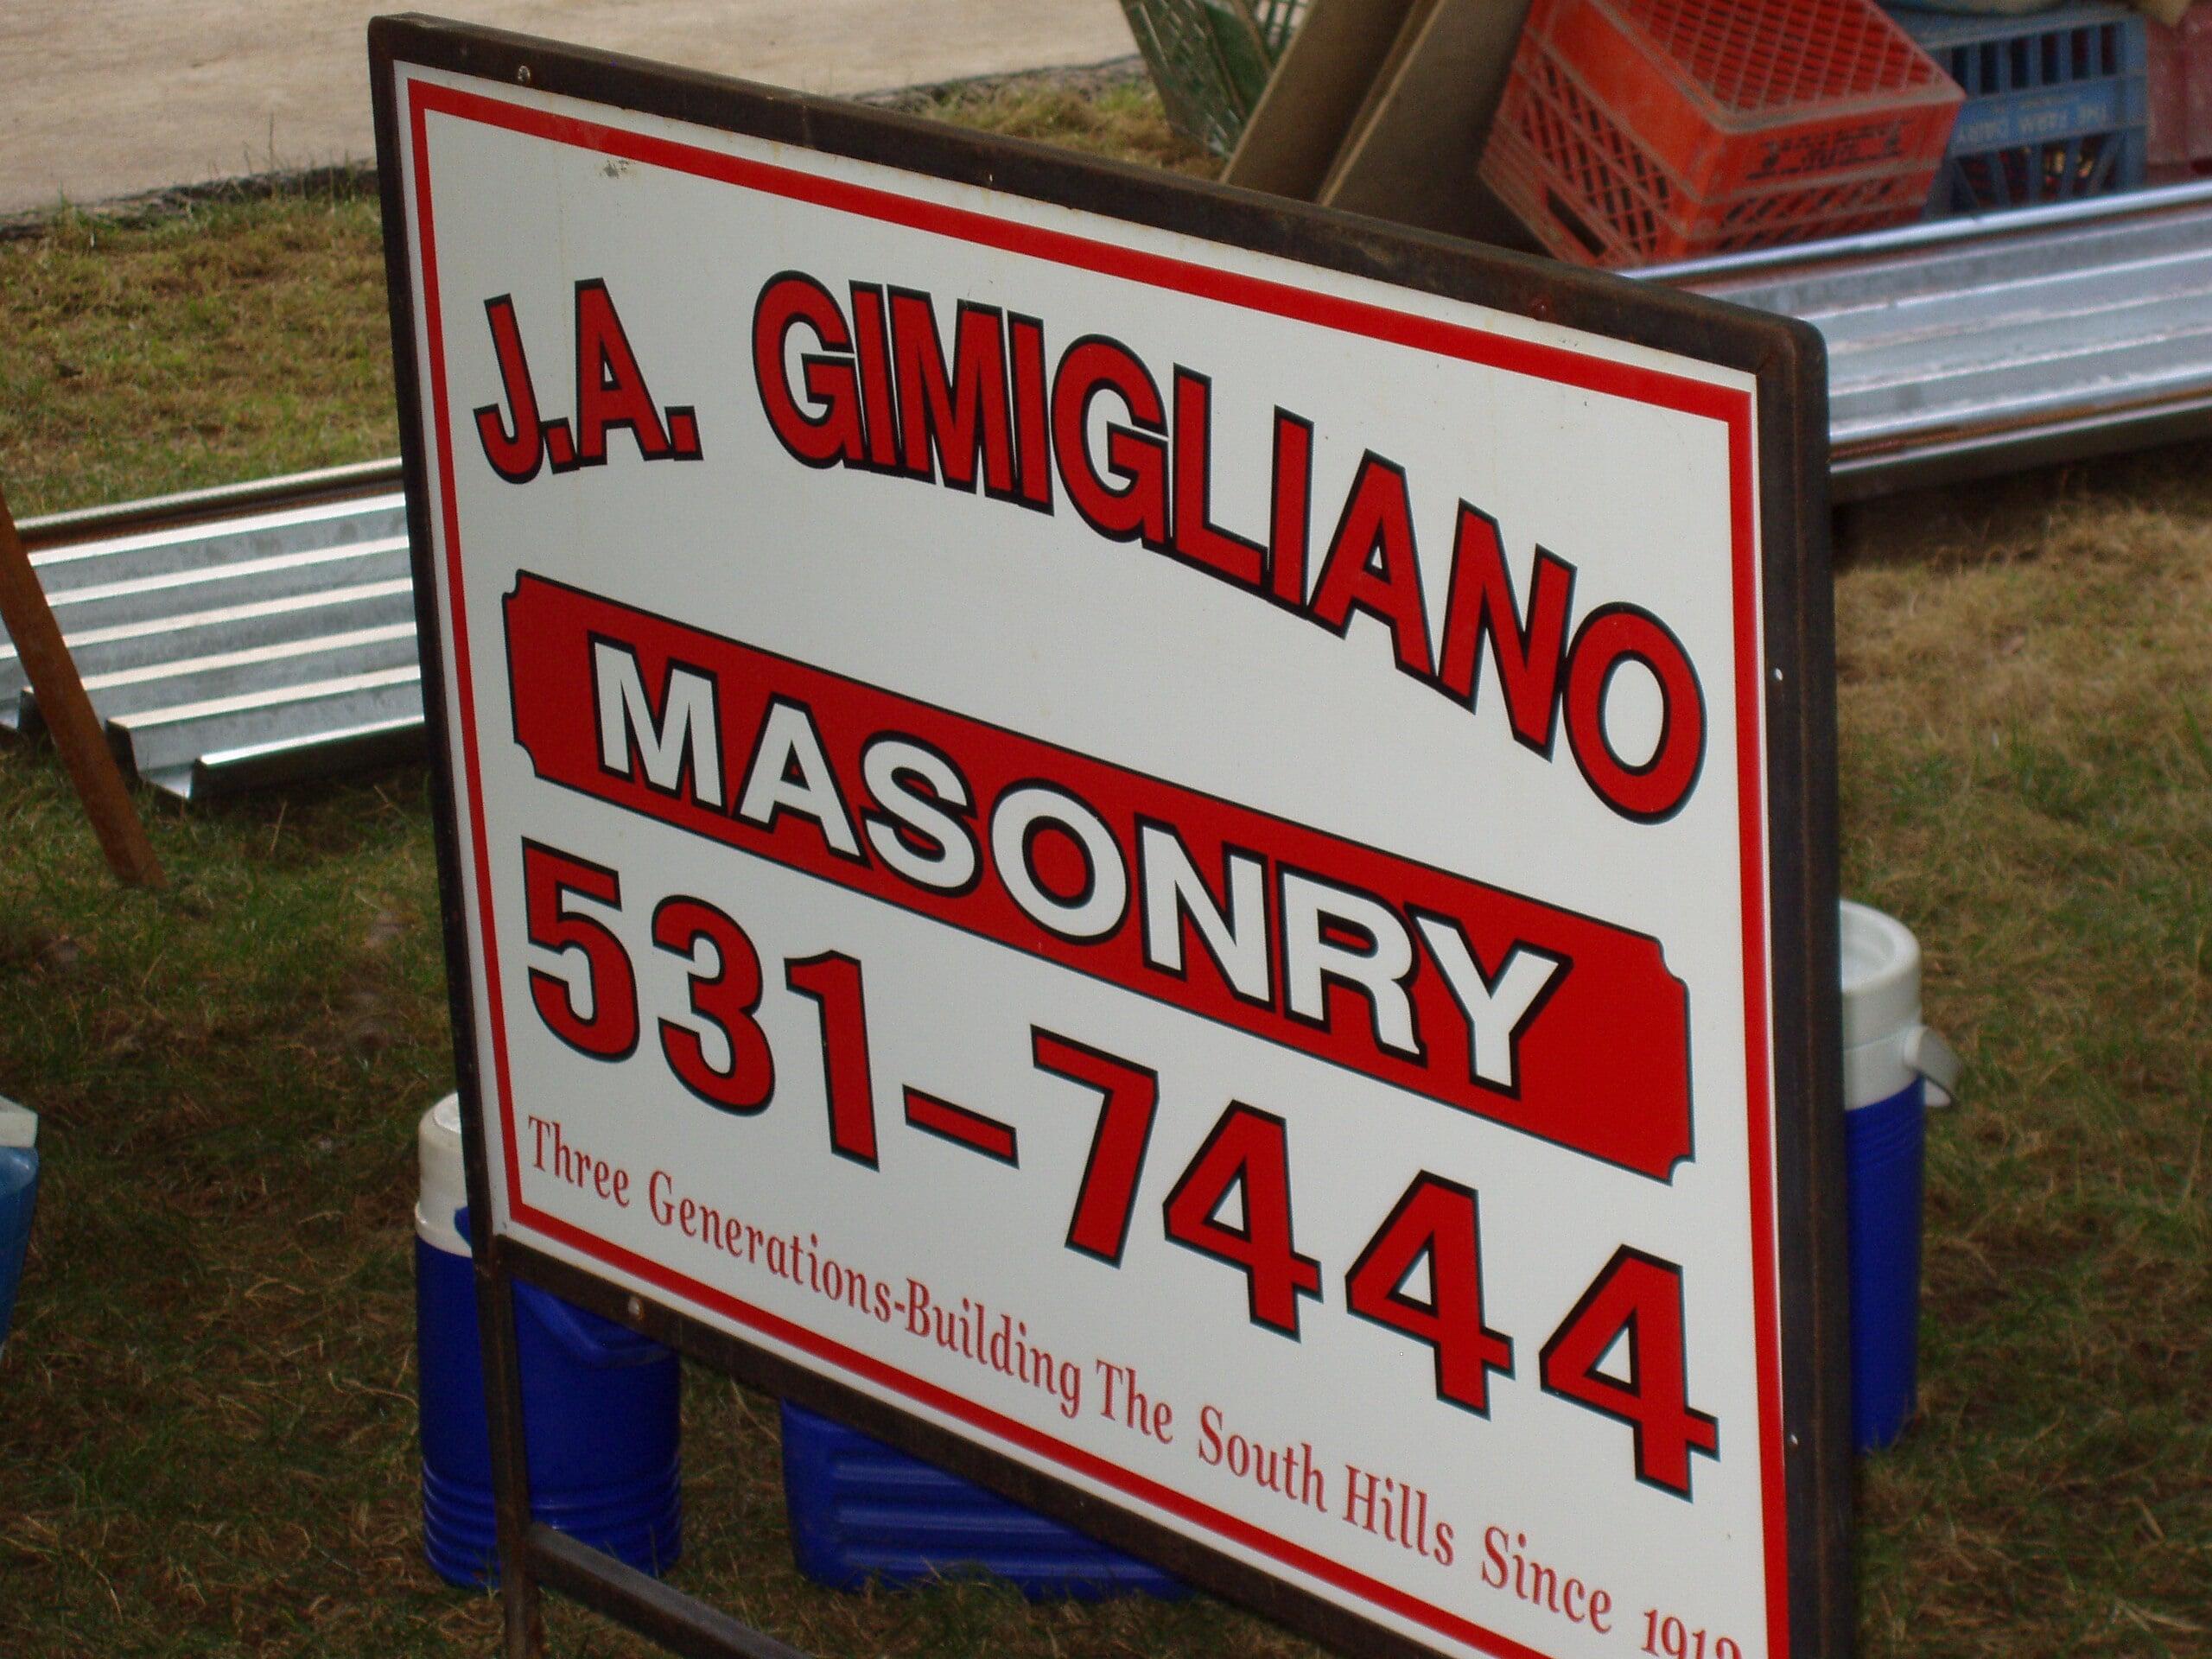 J.A. Gimigliano Masonry image 36